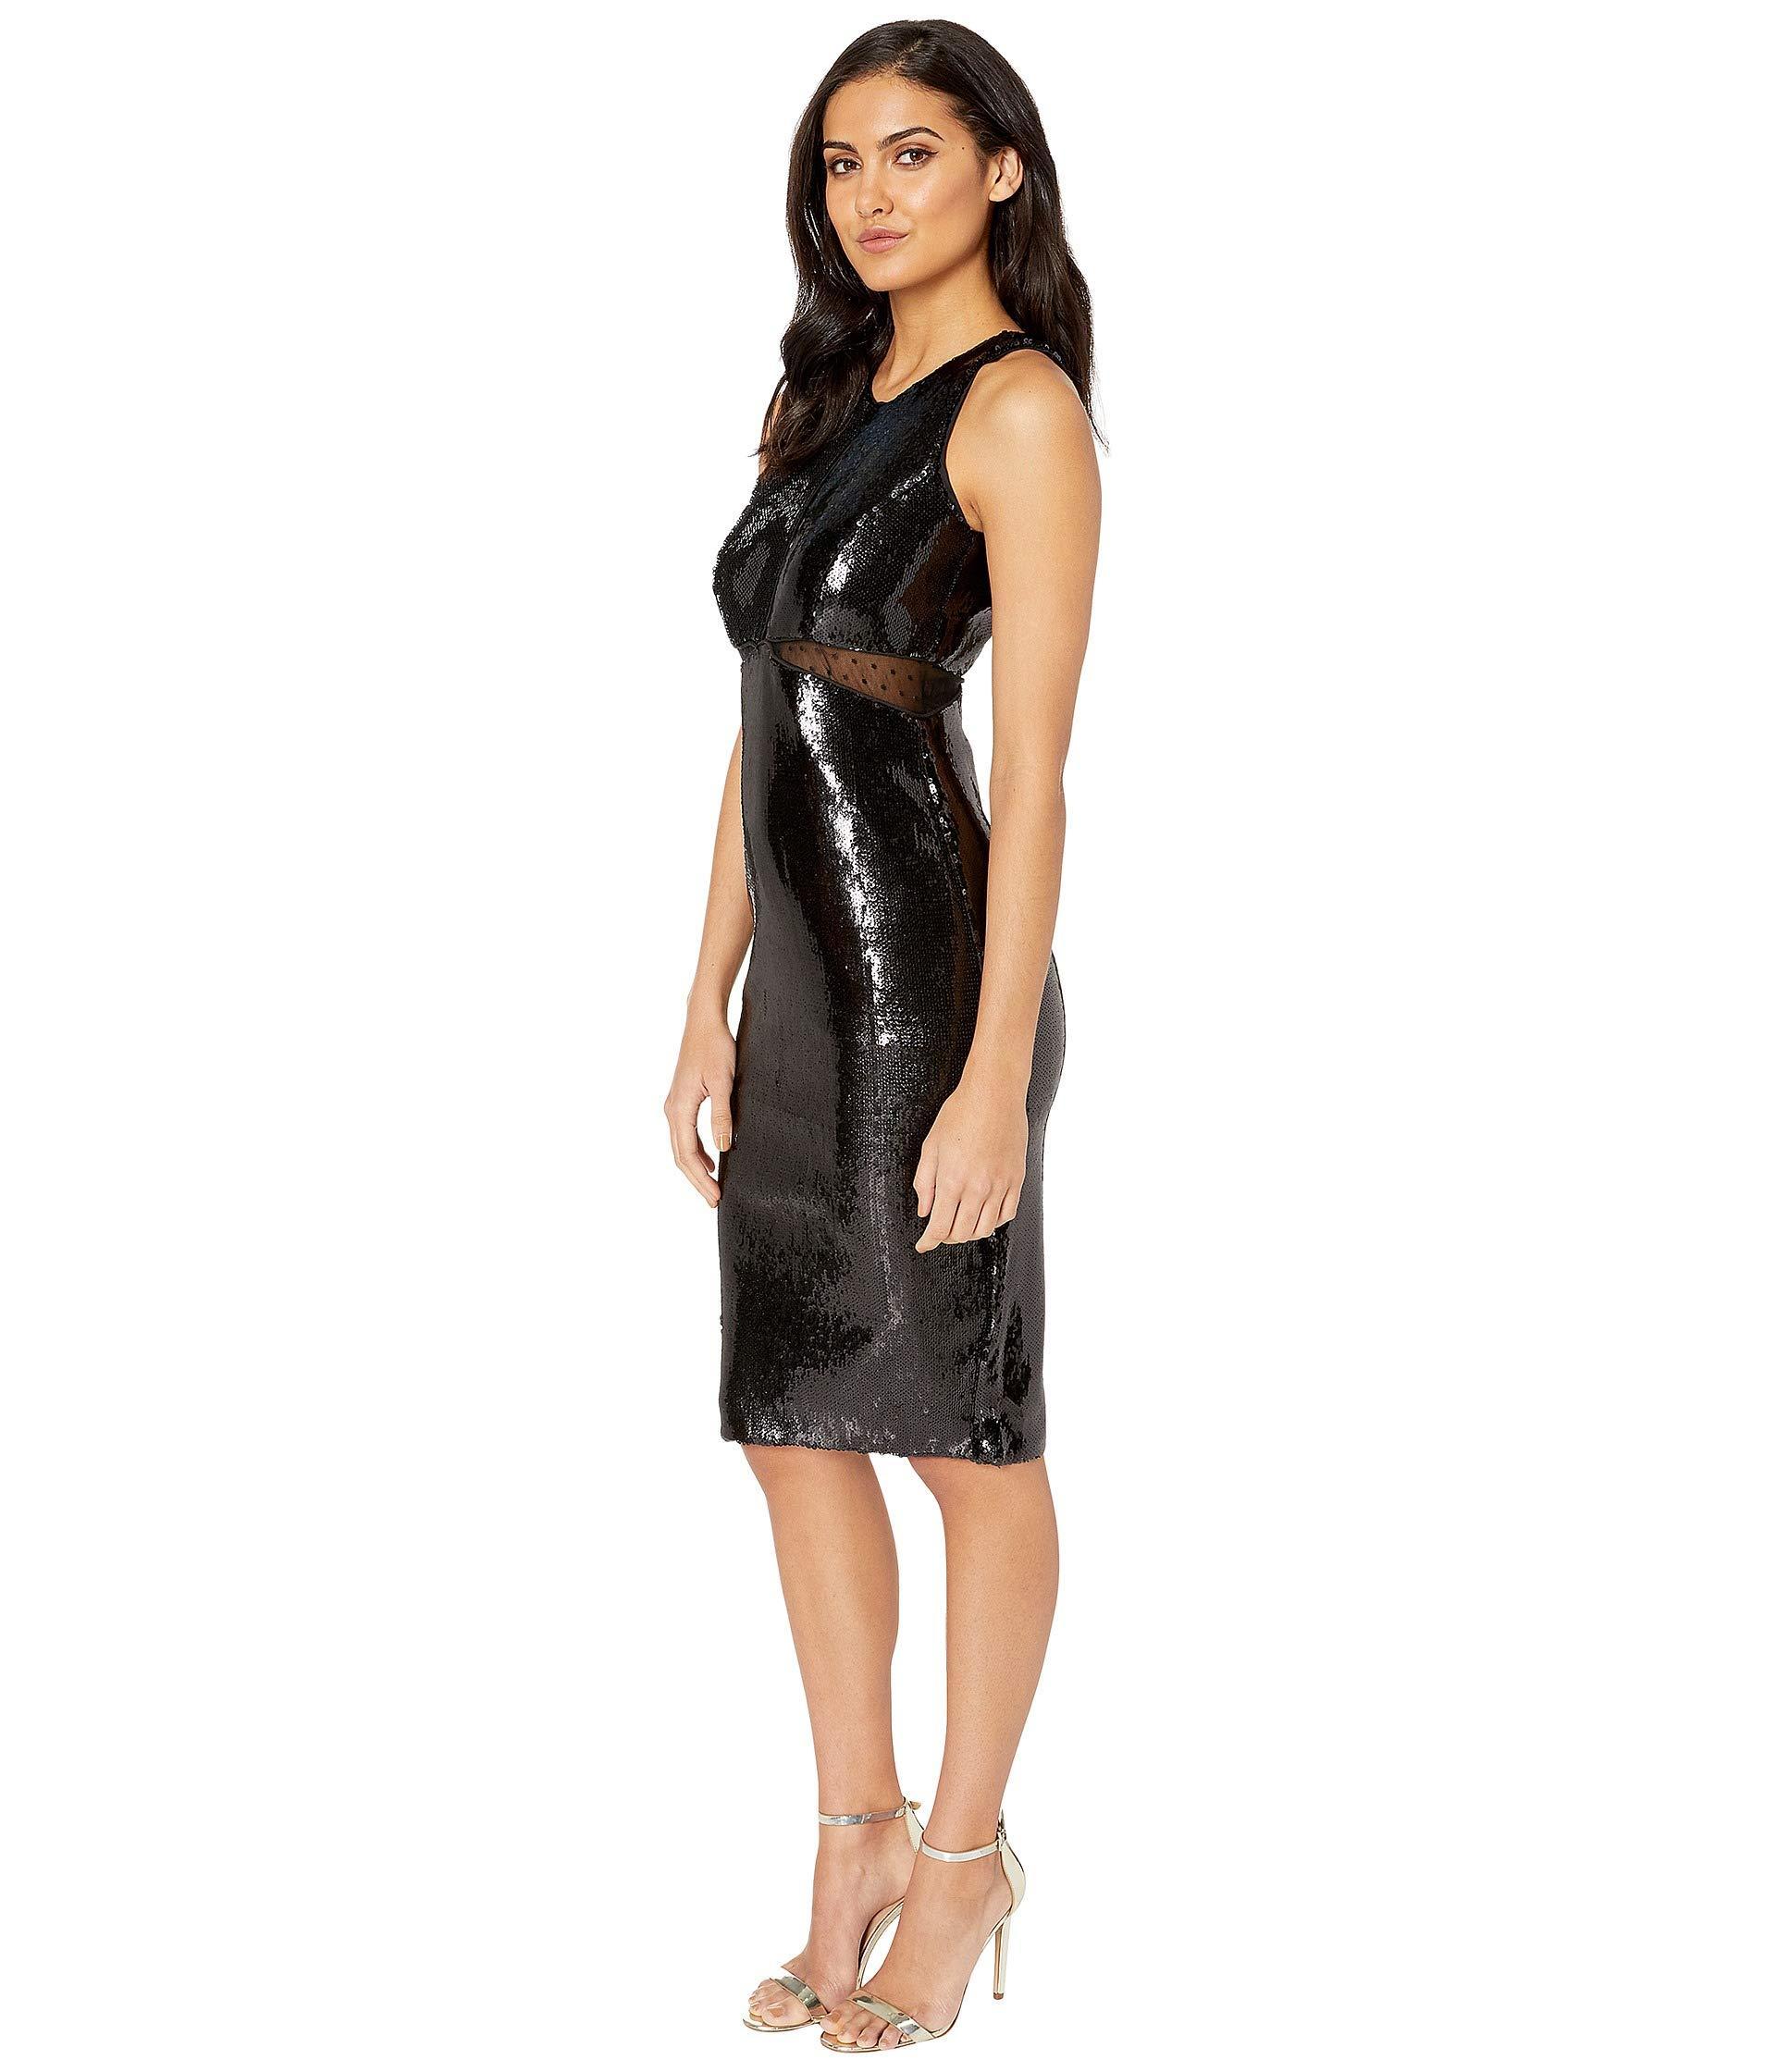 1aee8c5fb0a Lyst - Bardot Splice Sequin Dress in Black - Save 9%